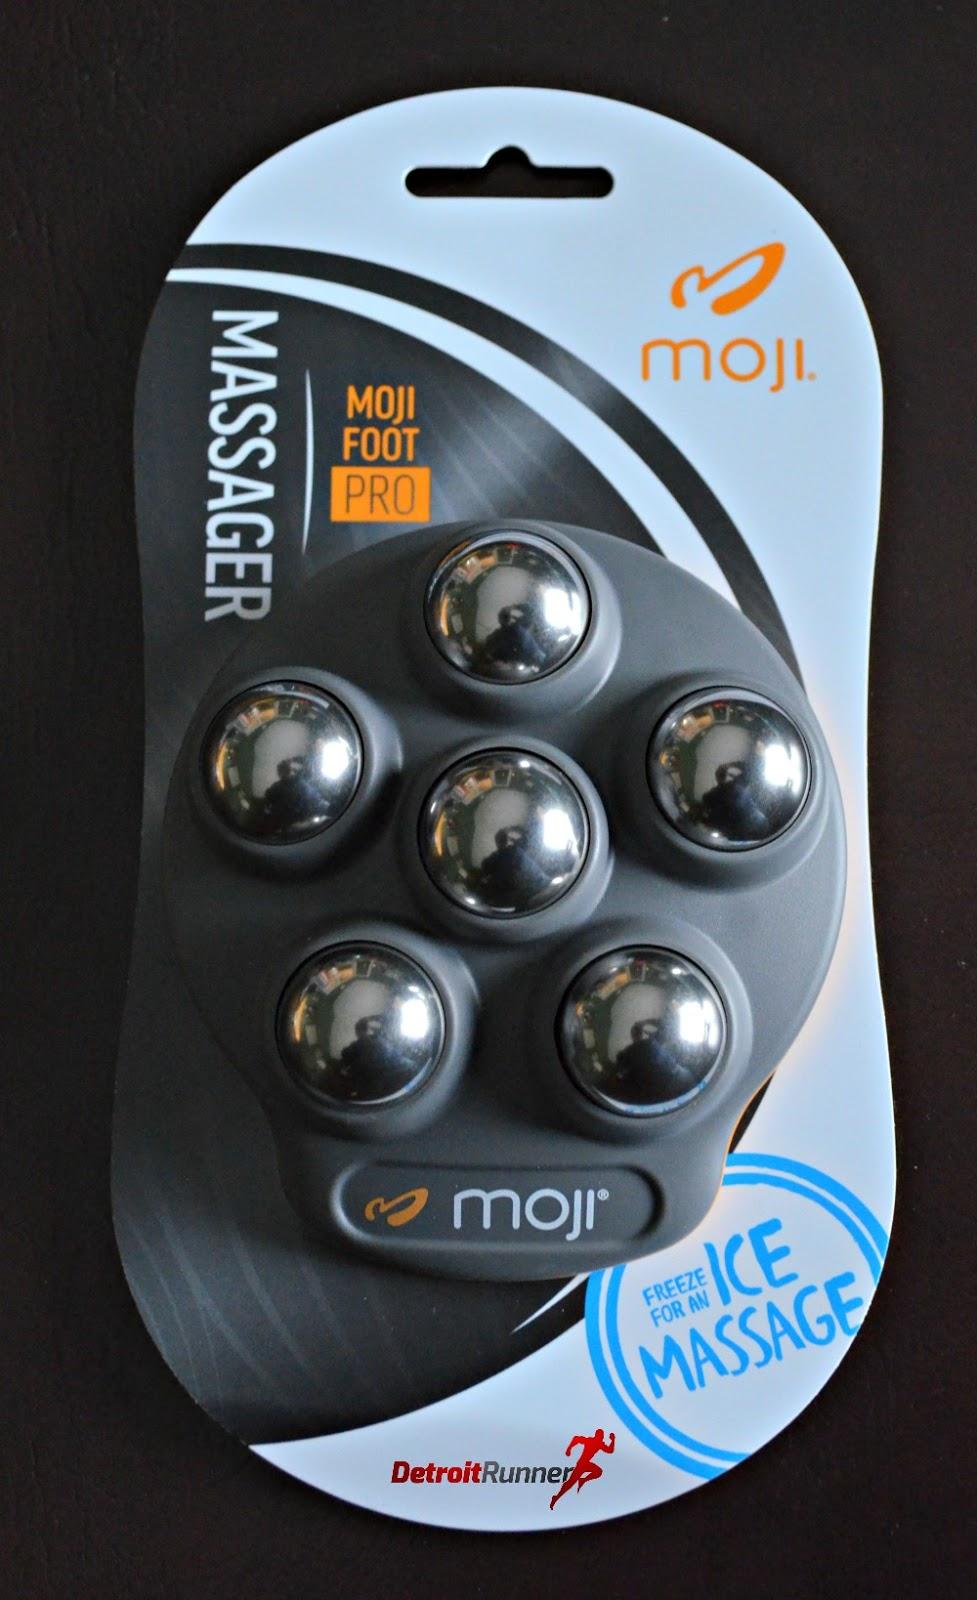 Moji Foot Massager